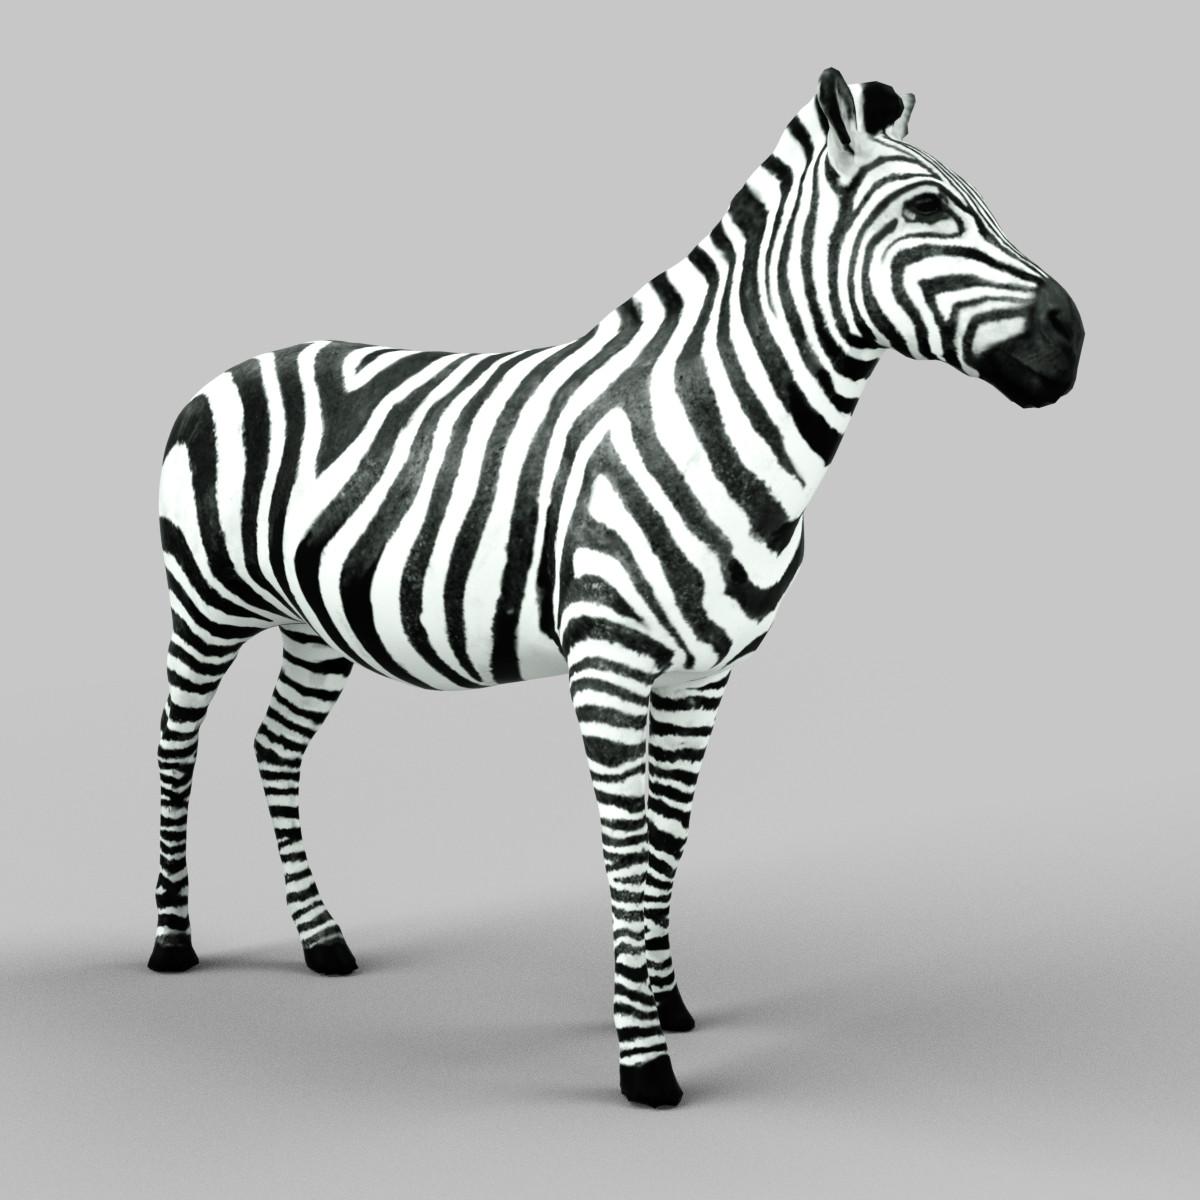 _0100_Zebra-1.png